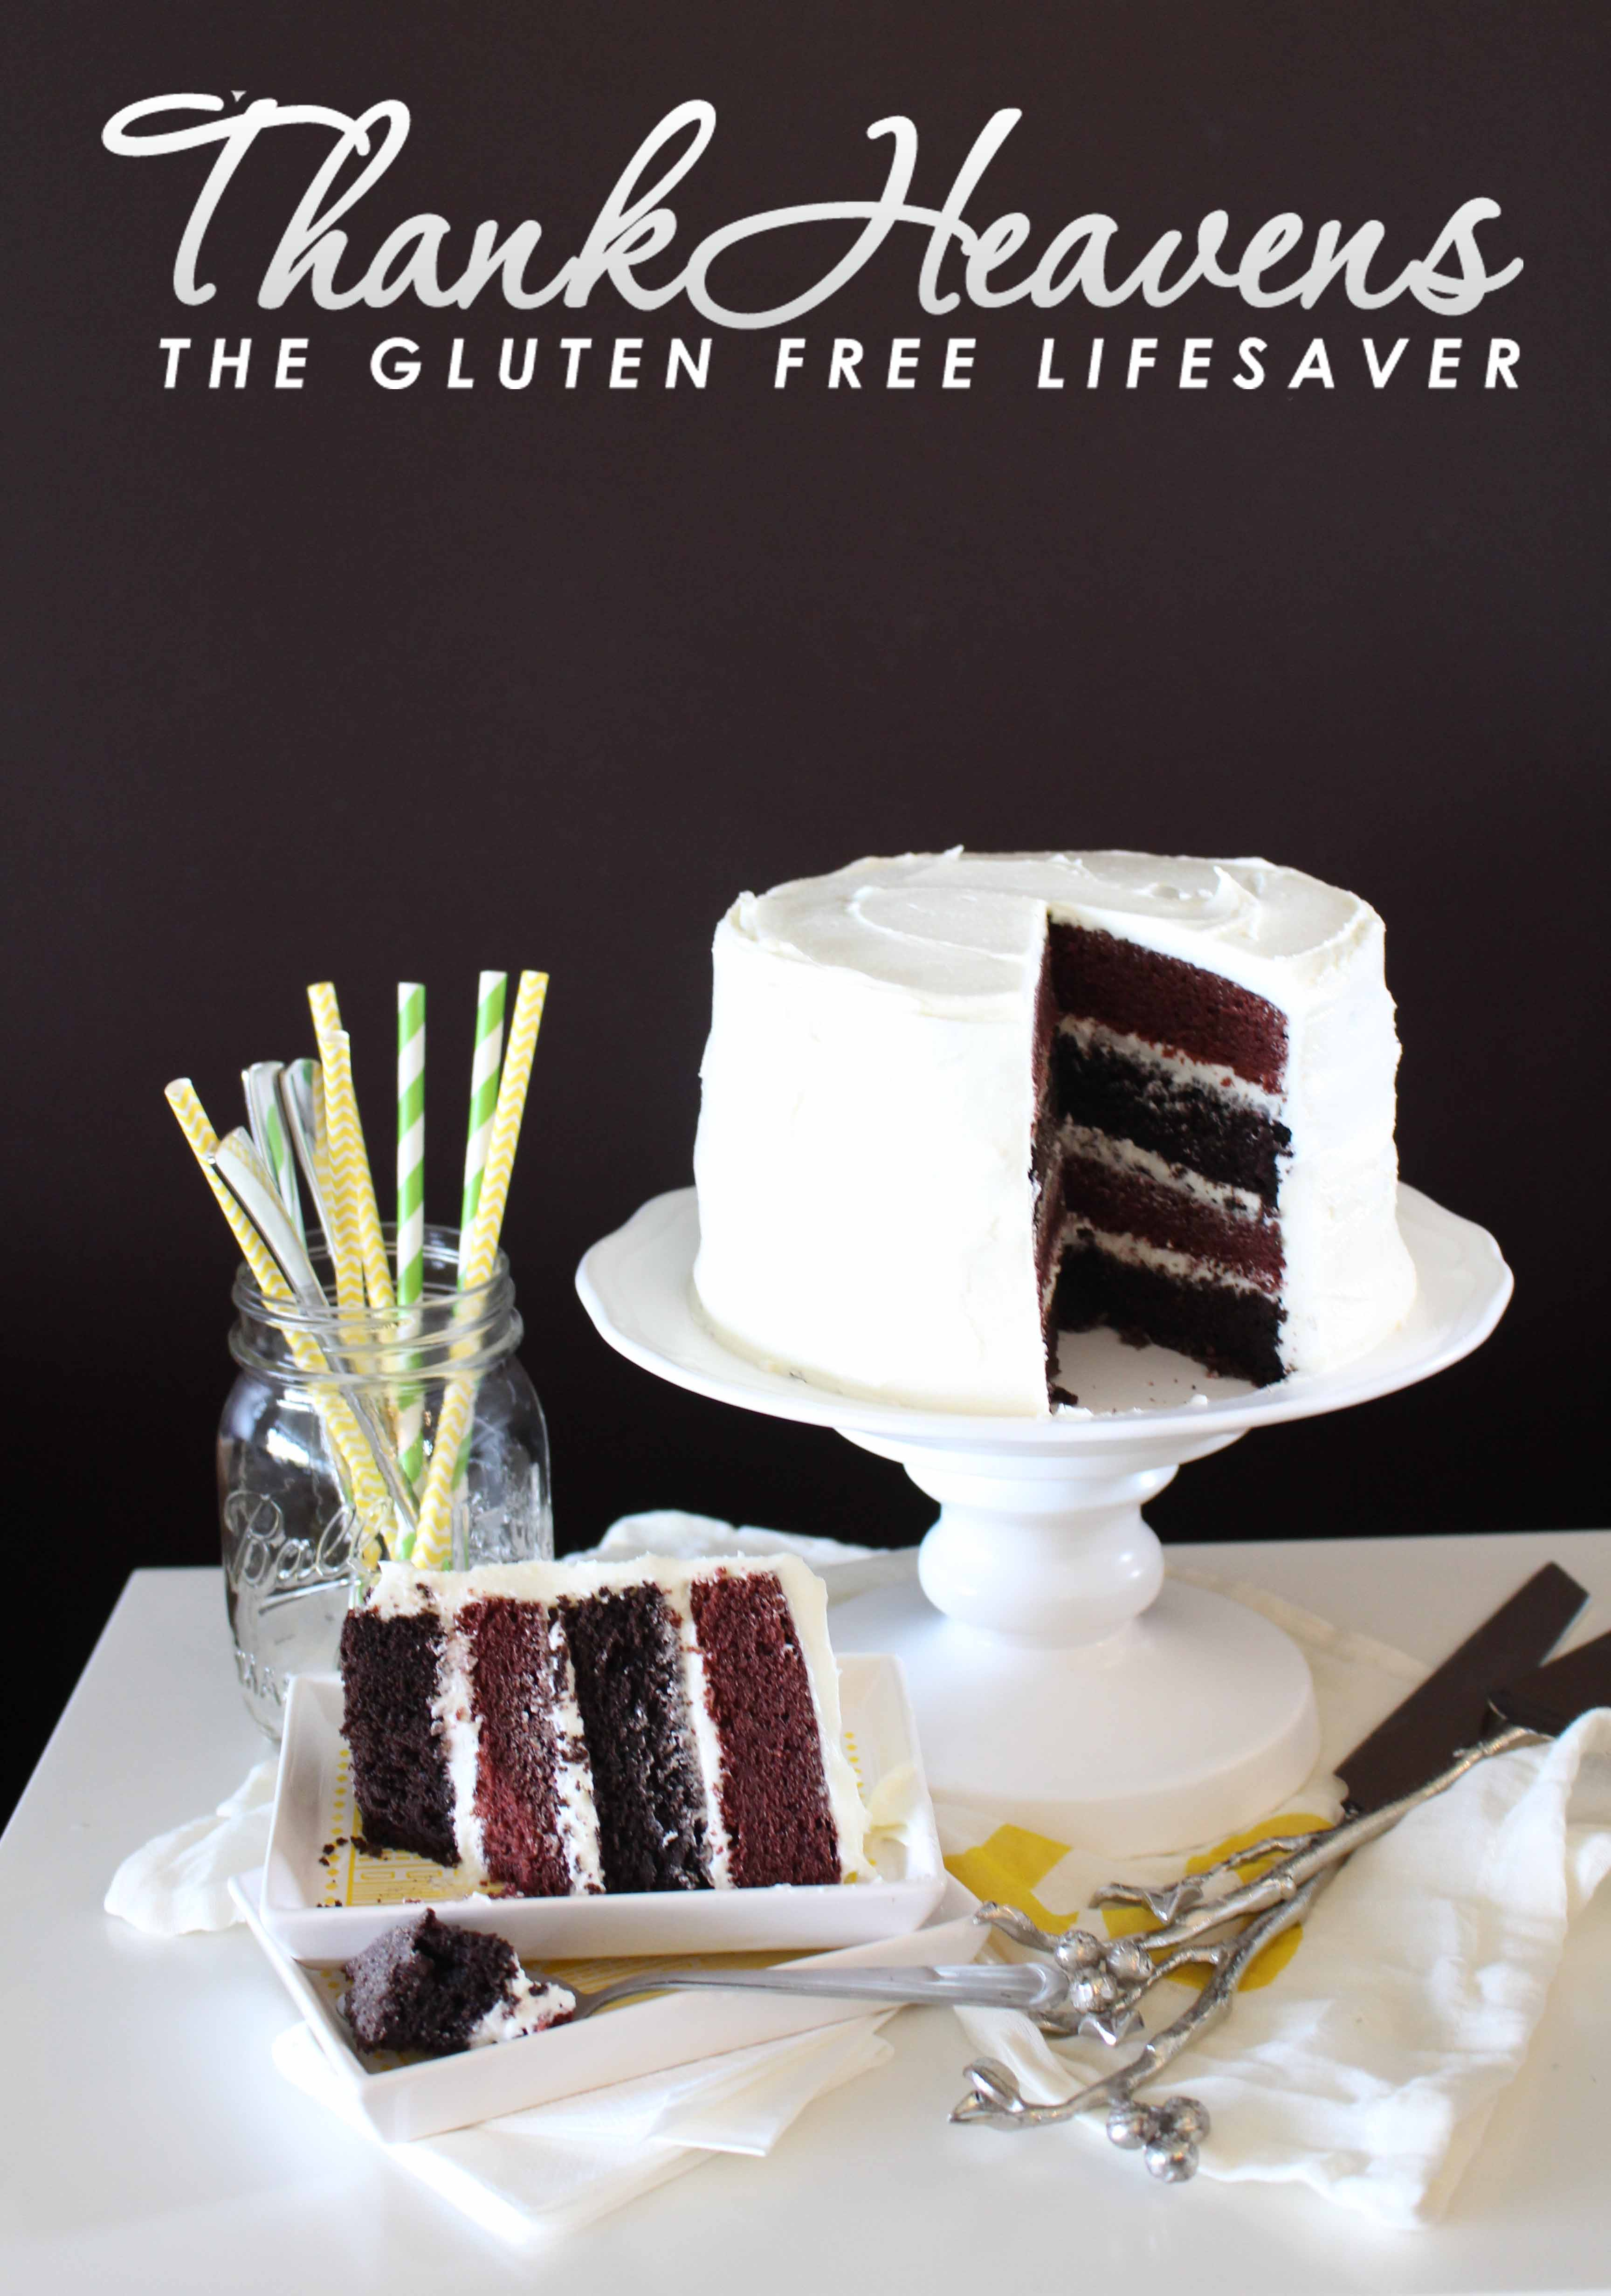 Chocolate Mud Cake Bonanza; Gluten-Free, Dairy-Free, and Super Quick ...